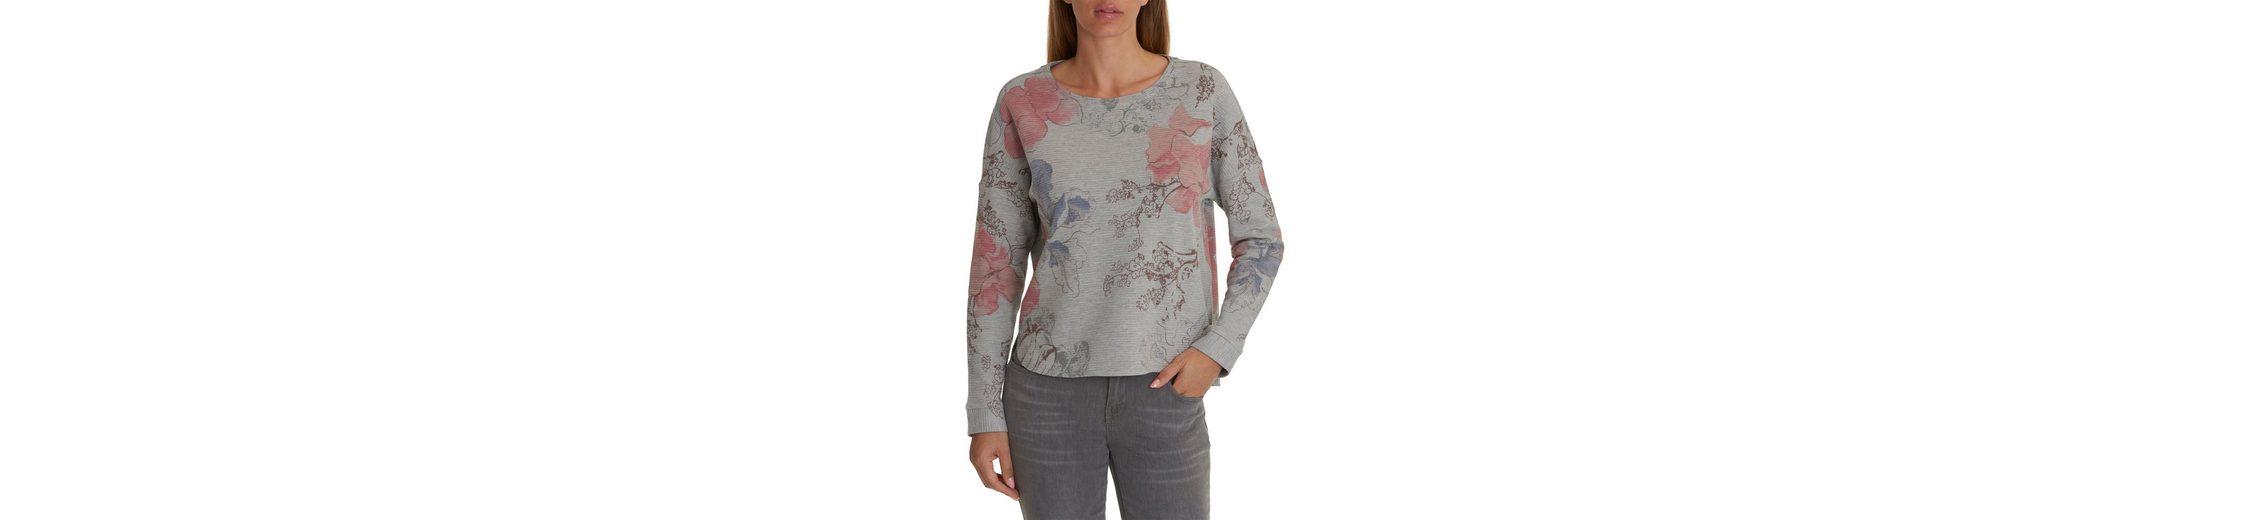 Allover Blumenprint mit Blumenprint amp;Co Sweatshirt Allover Betty Betty amp;Co mit Sweatshirt pII6qC